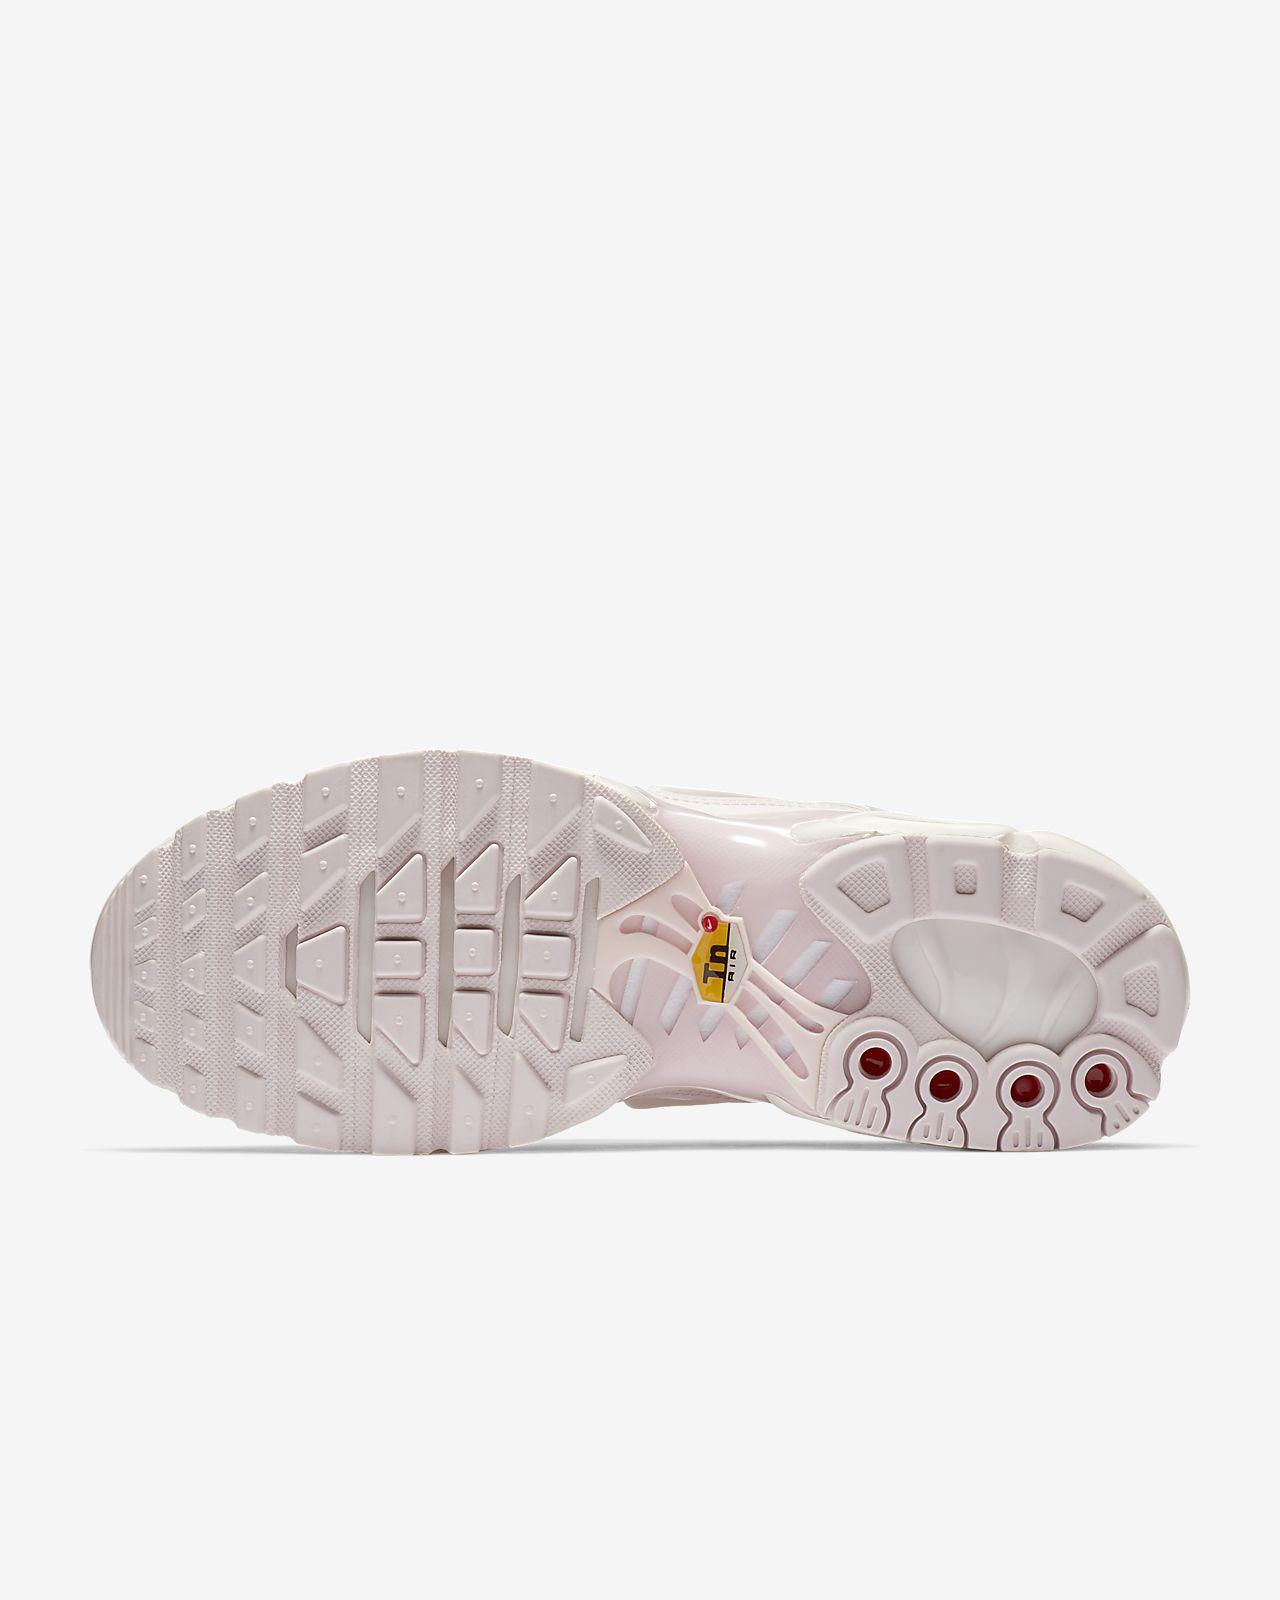 low priced c4436 01468 Tn Plus Femme Ca Max Chaussure Air Nike Pour Se qw0H0IftB